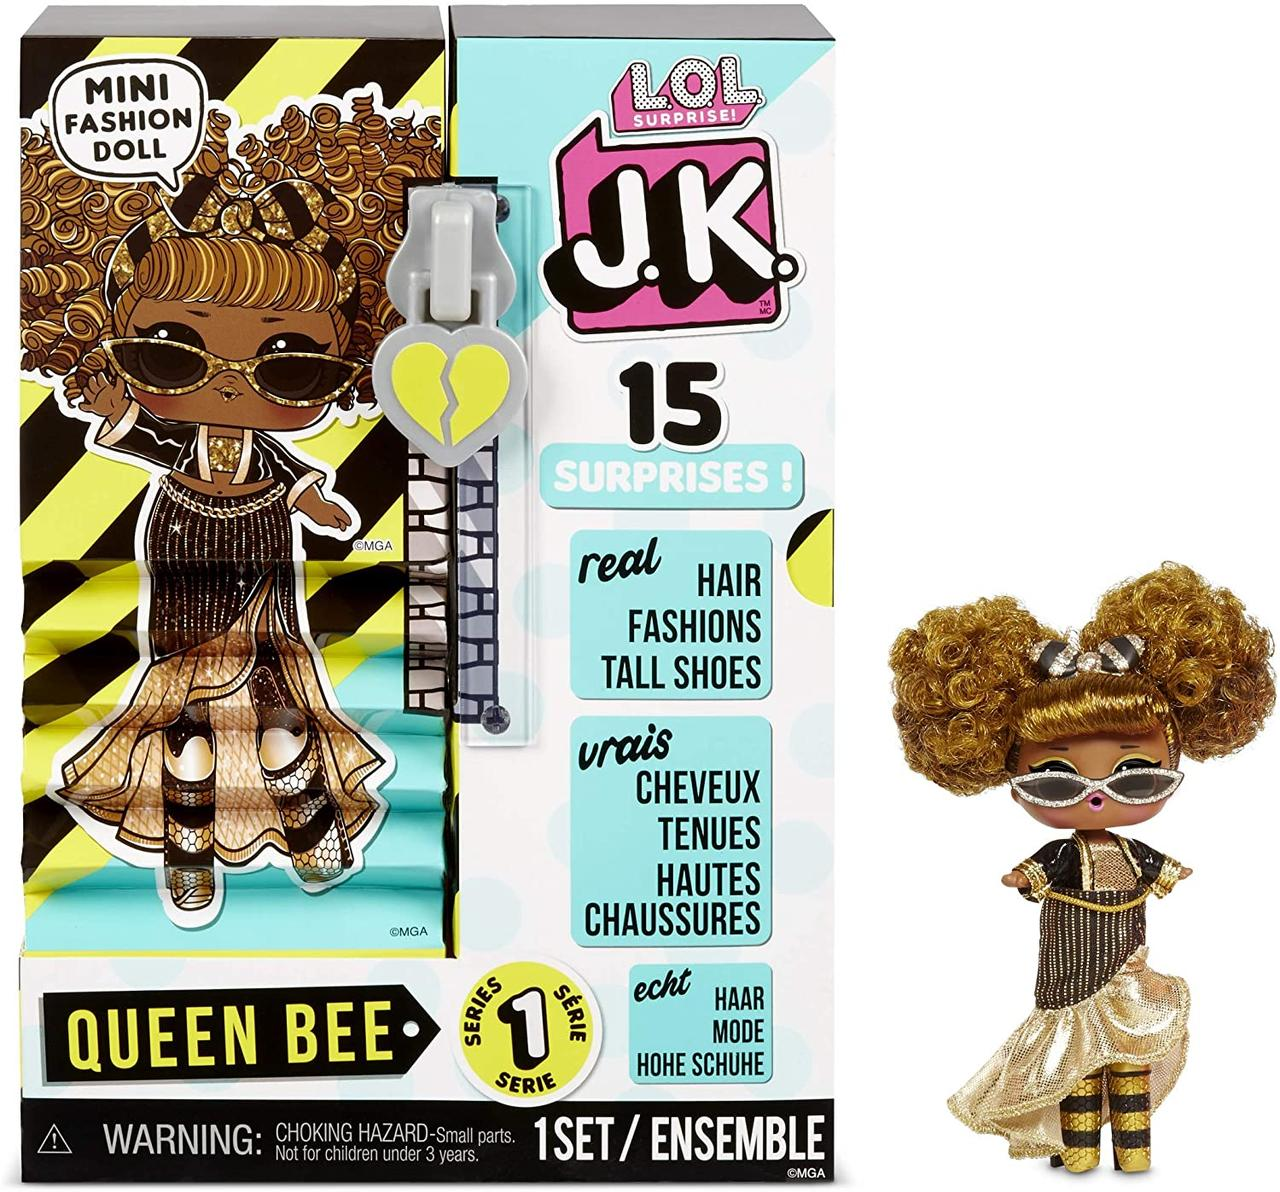 Кукла ЛОЛ королева пчелка L.O.L. Surprise! JK Queen Bee Mini Fashion Doll with 15 Surprises